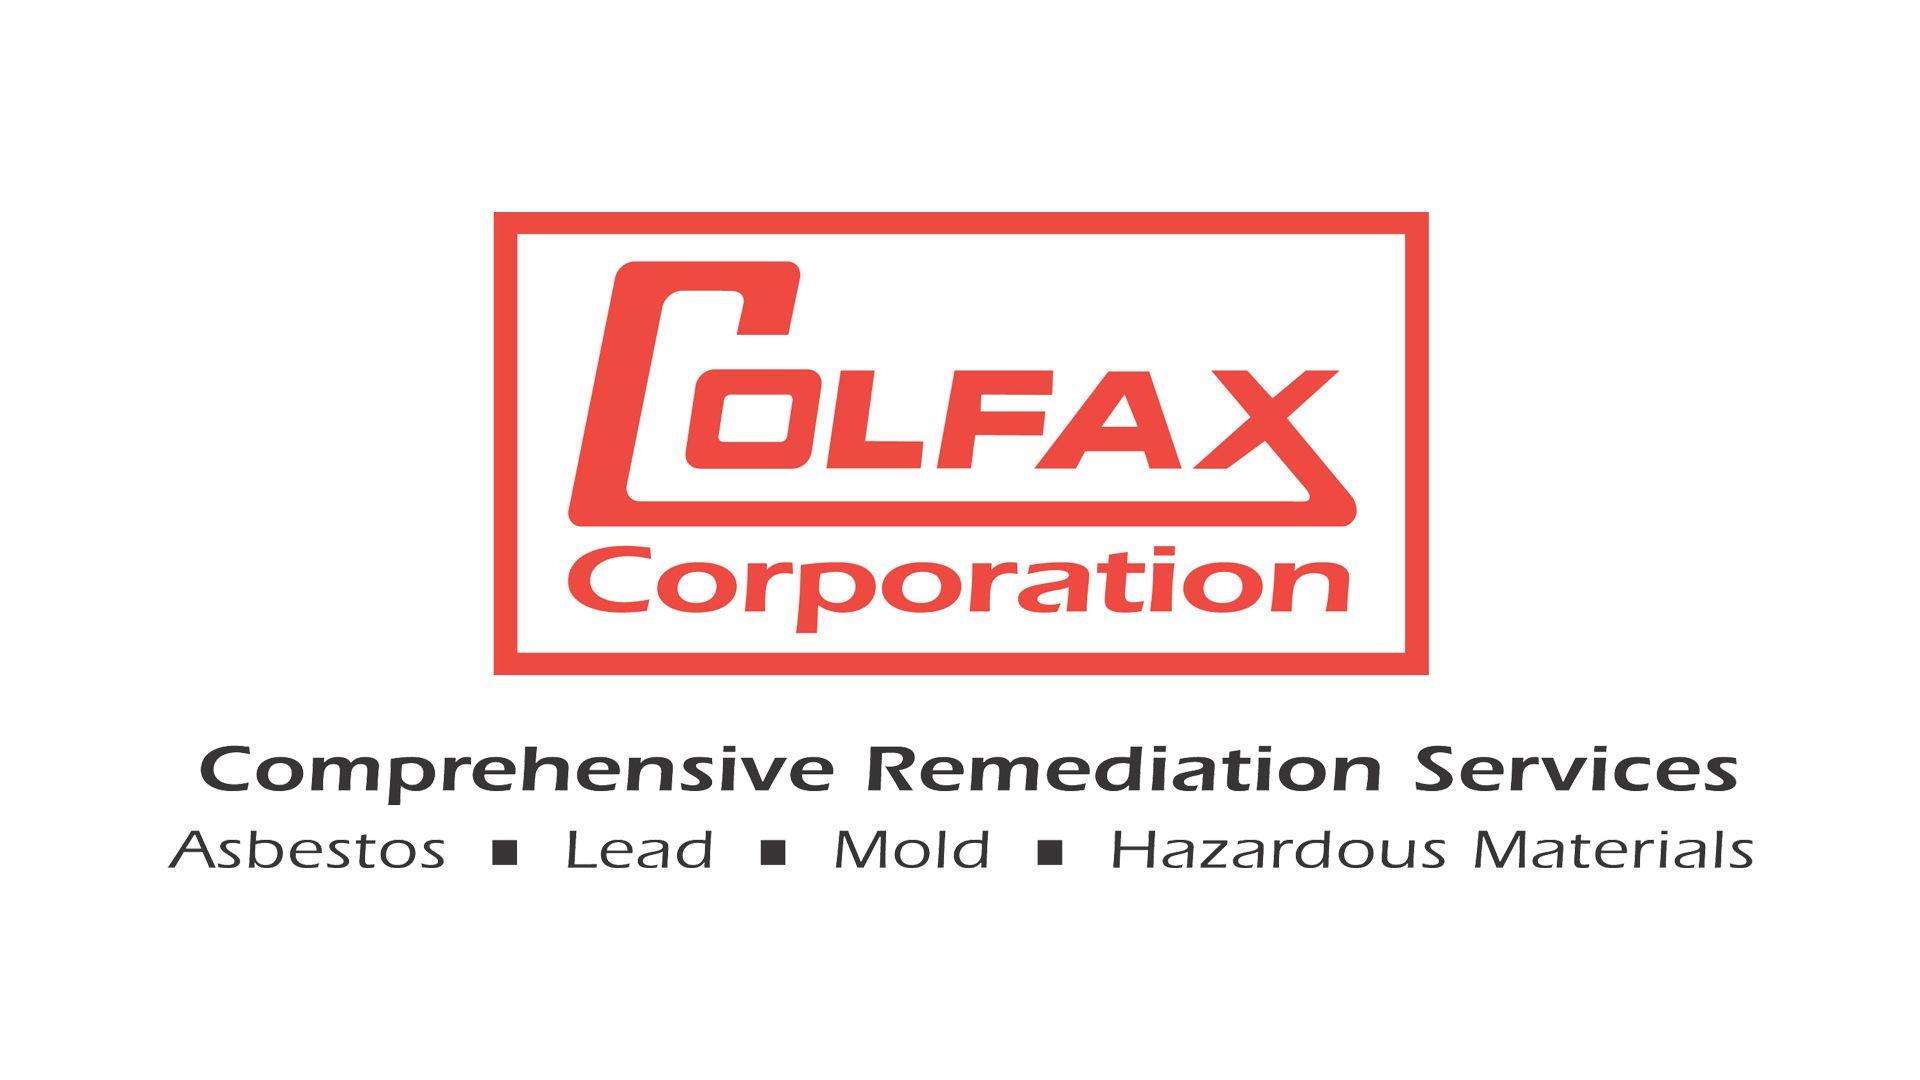 Colfax Corporation